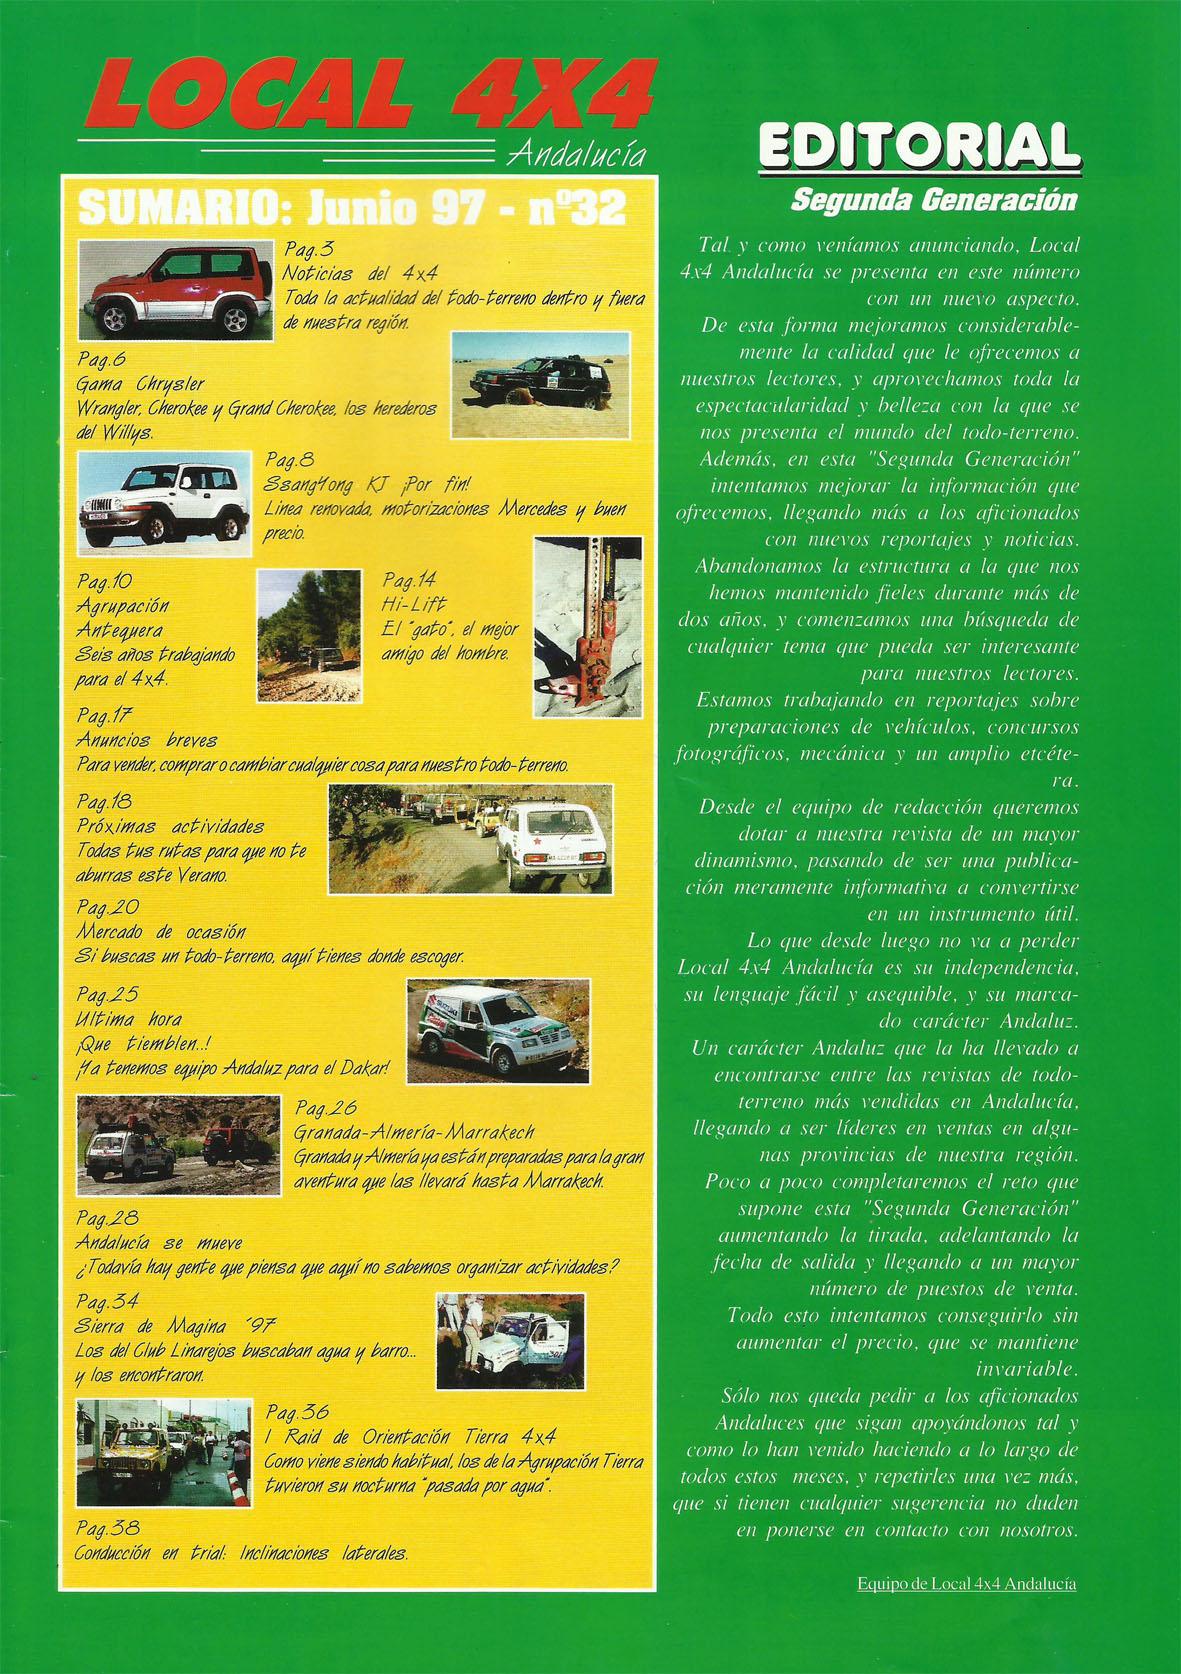 Revista Local 4x4 32 01